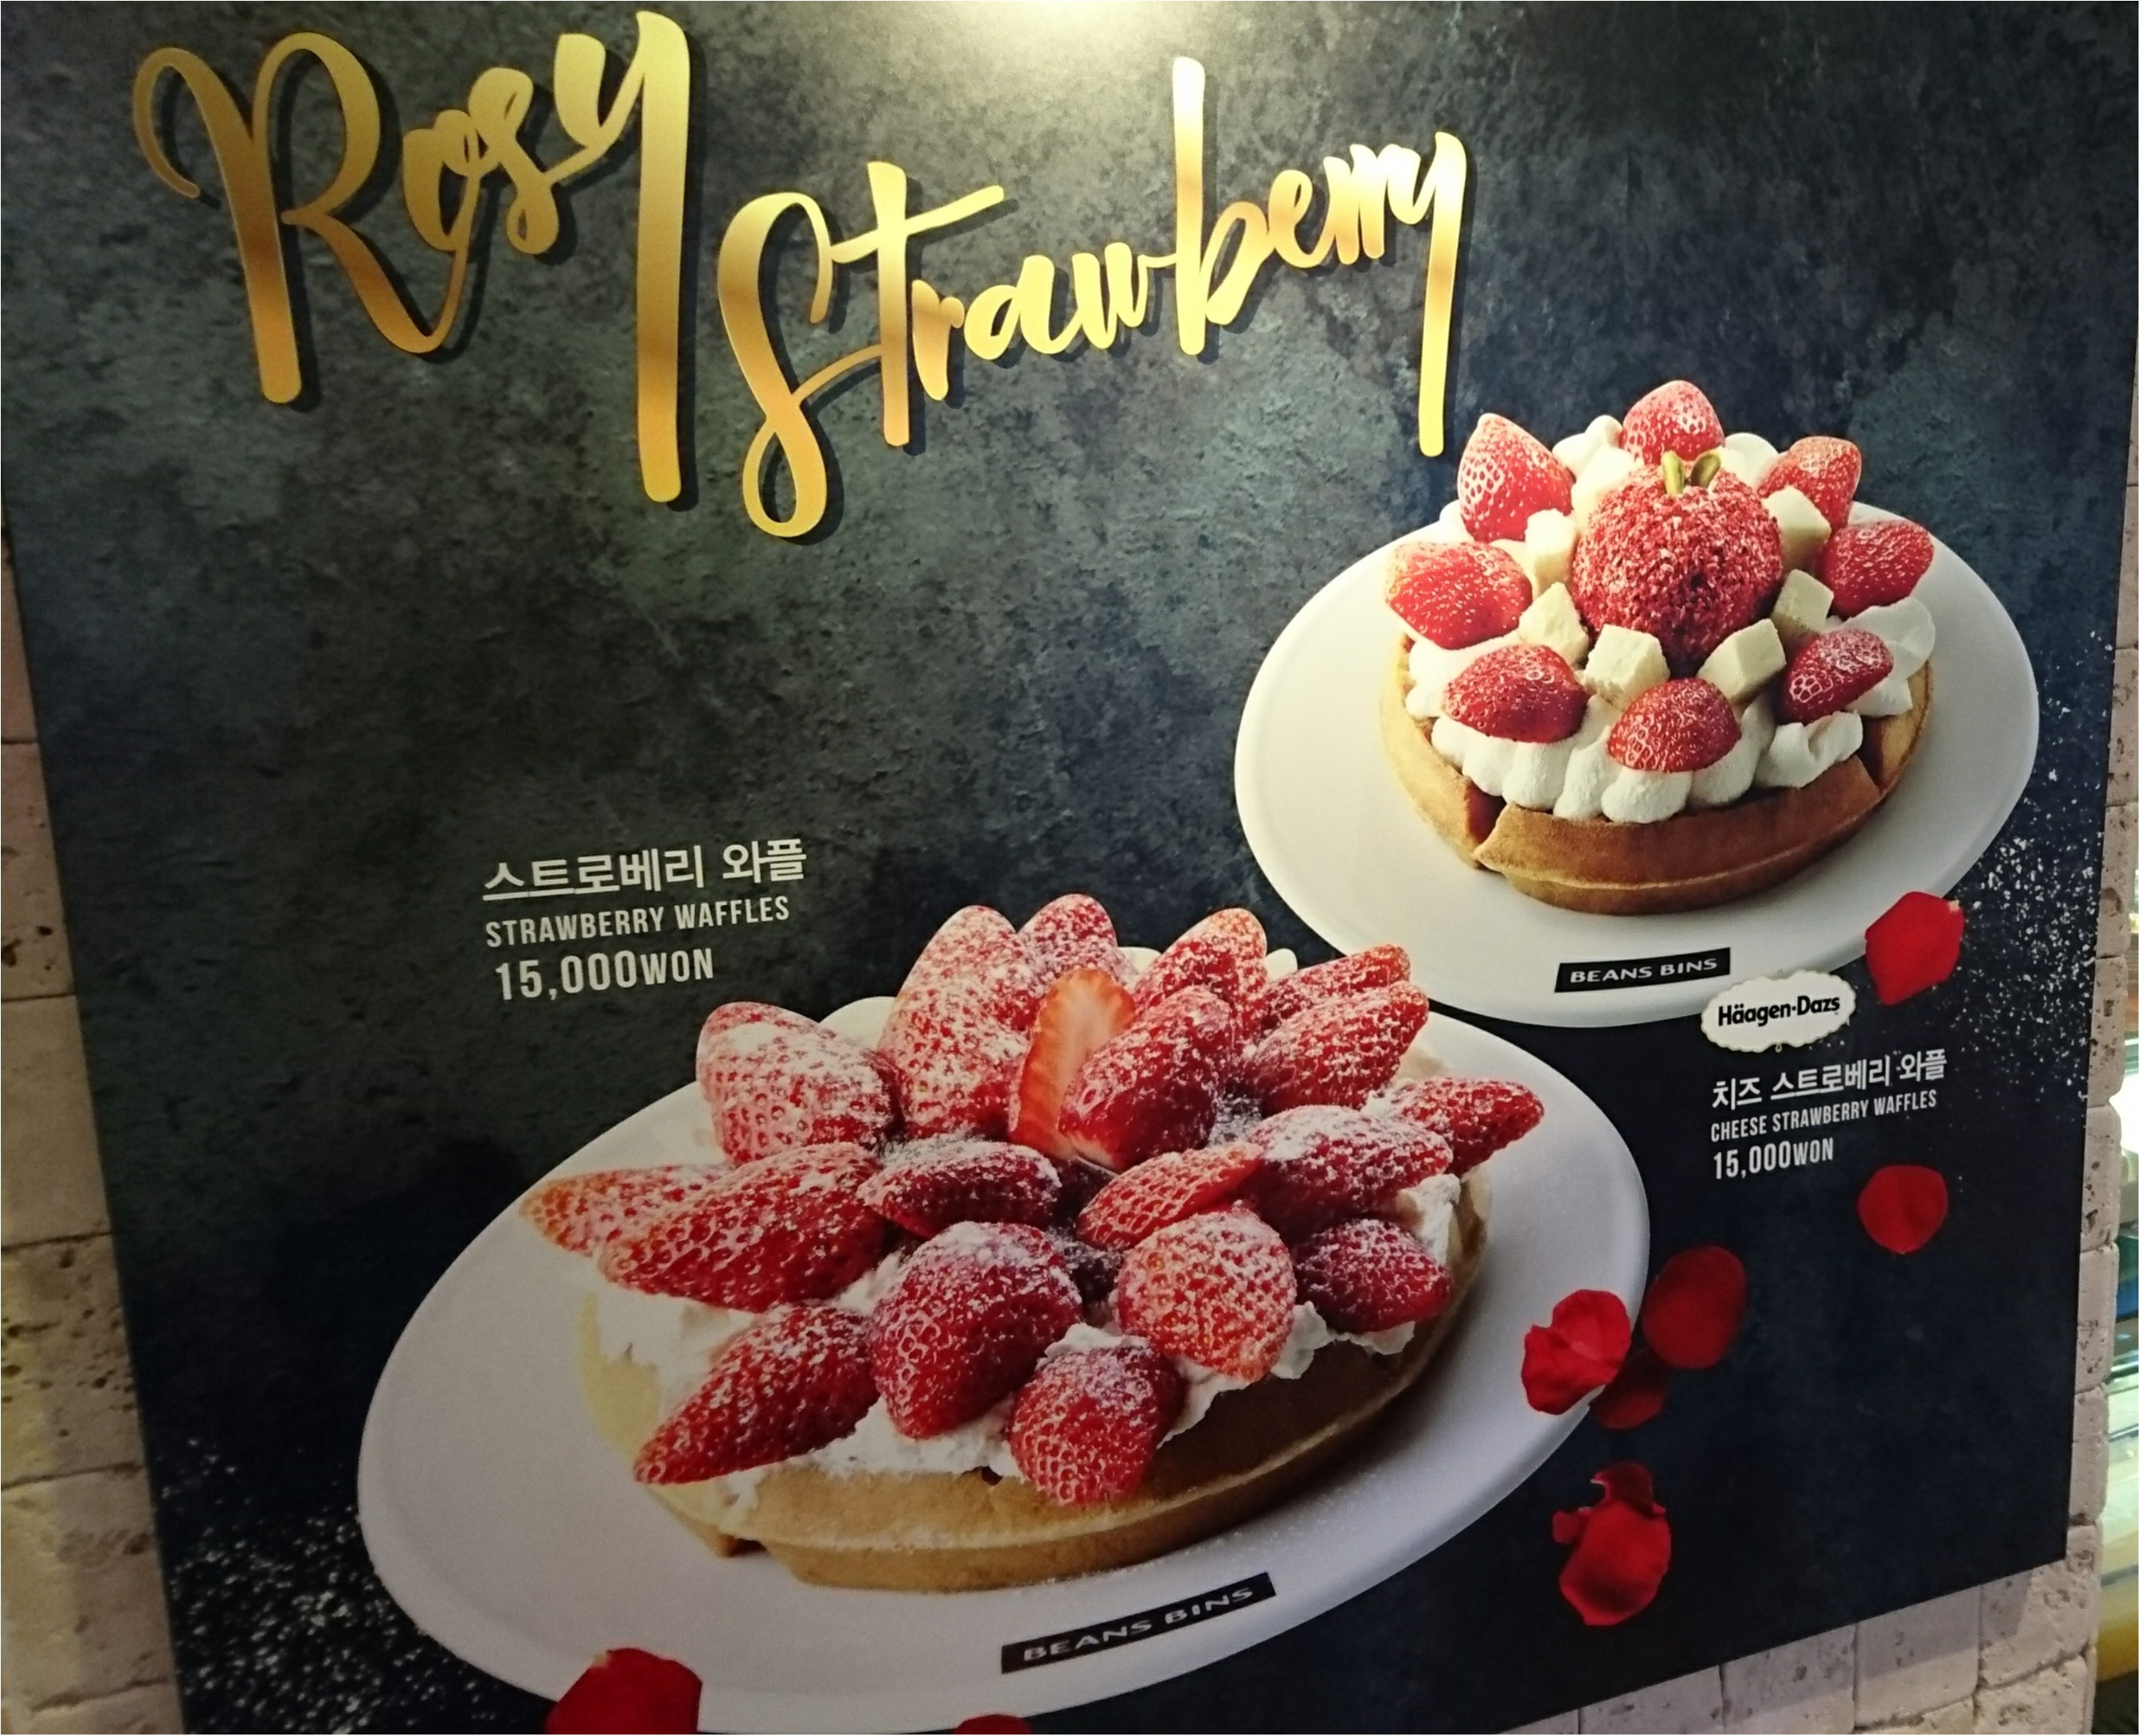 【trip】ソウルに行ったら絶対食べたい!ひそかに話題沸騰のインスタ映えワッフル♡_3_1